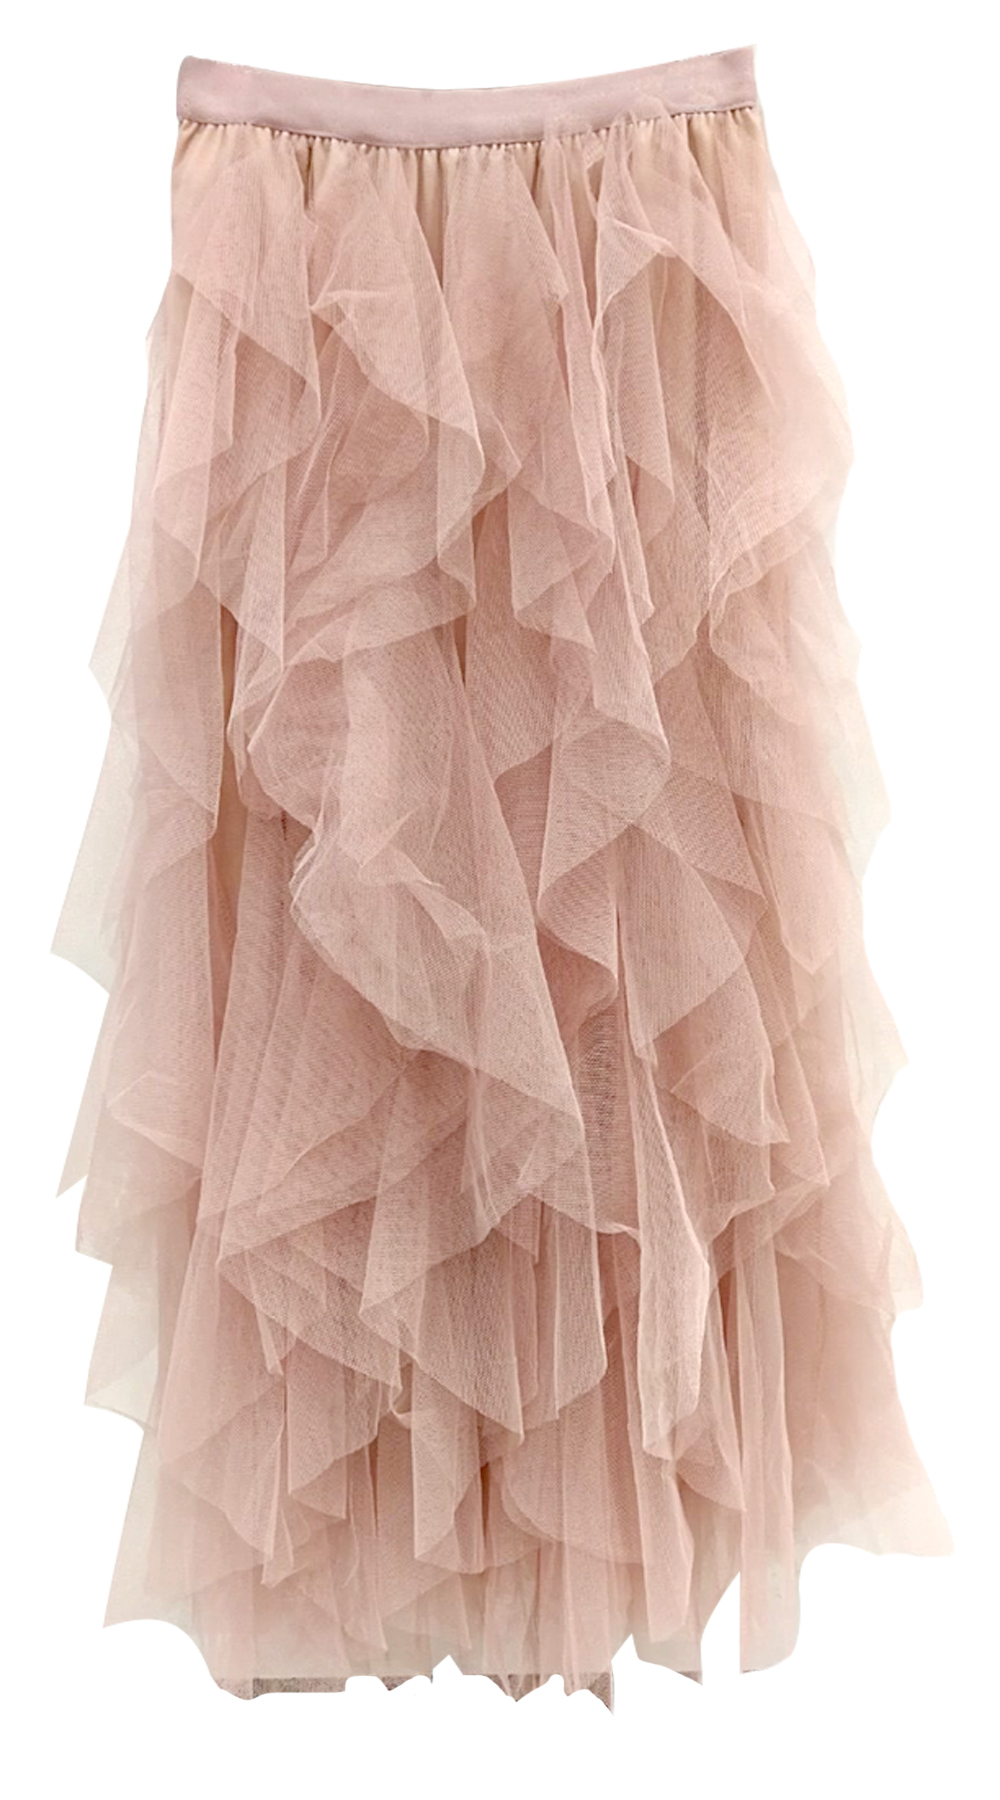 823f99e1d1a Τουτου Μίντι Φούστα | Υπέροχες φούστες σε όλα τα μήκη | missreina.com